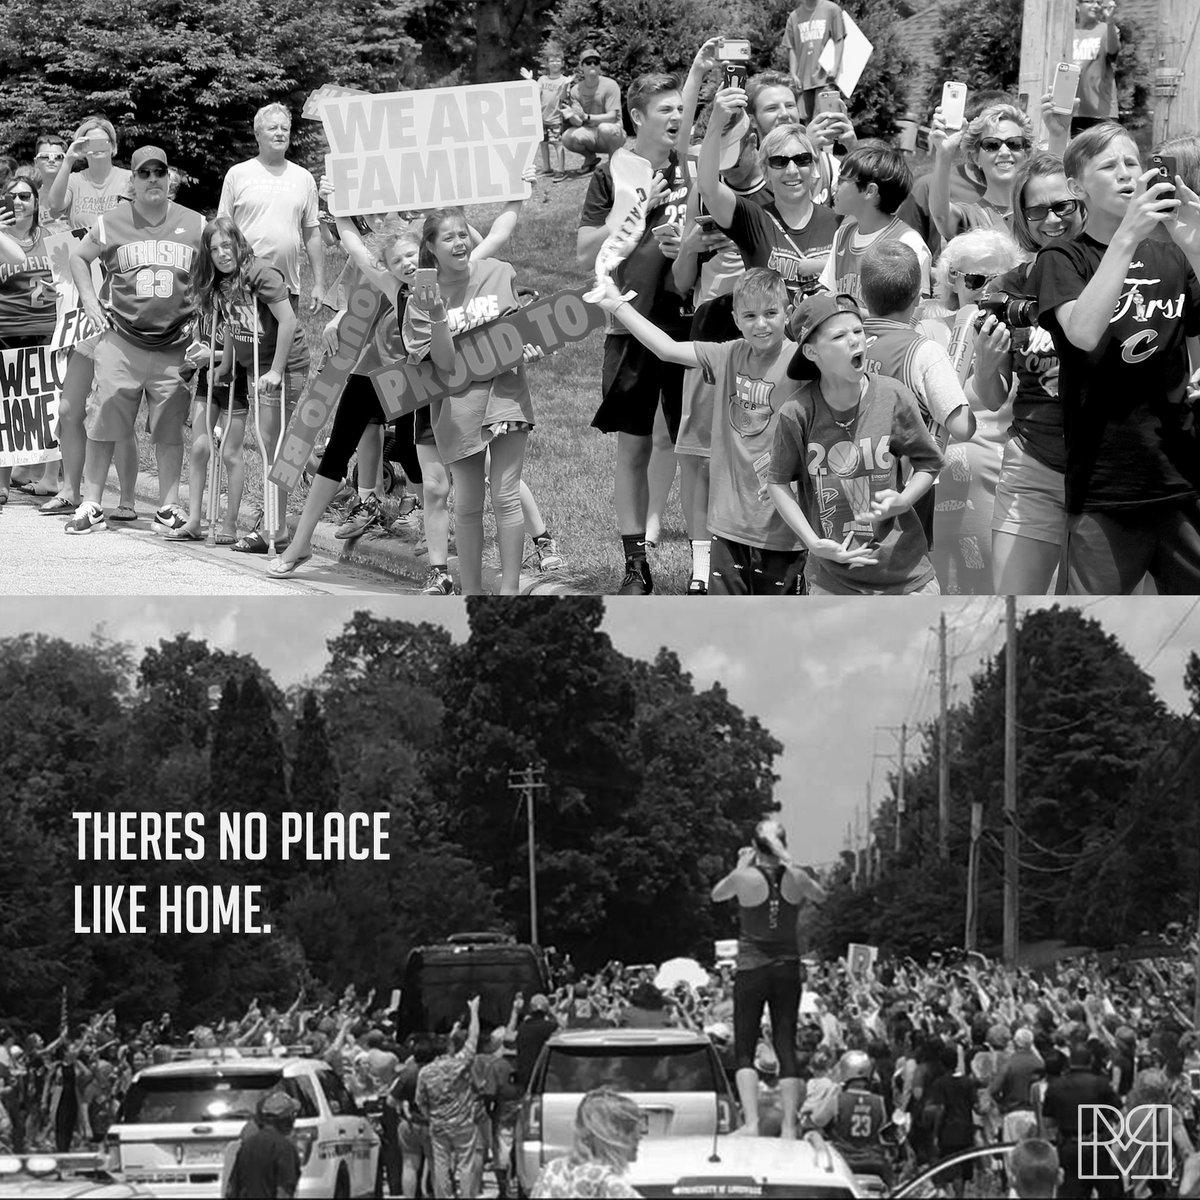 .@KingJames pulling in as Akron welcomes him home https://t.co/wAz1Esc6vX